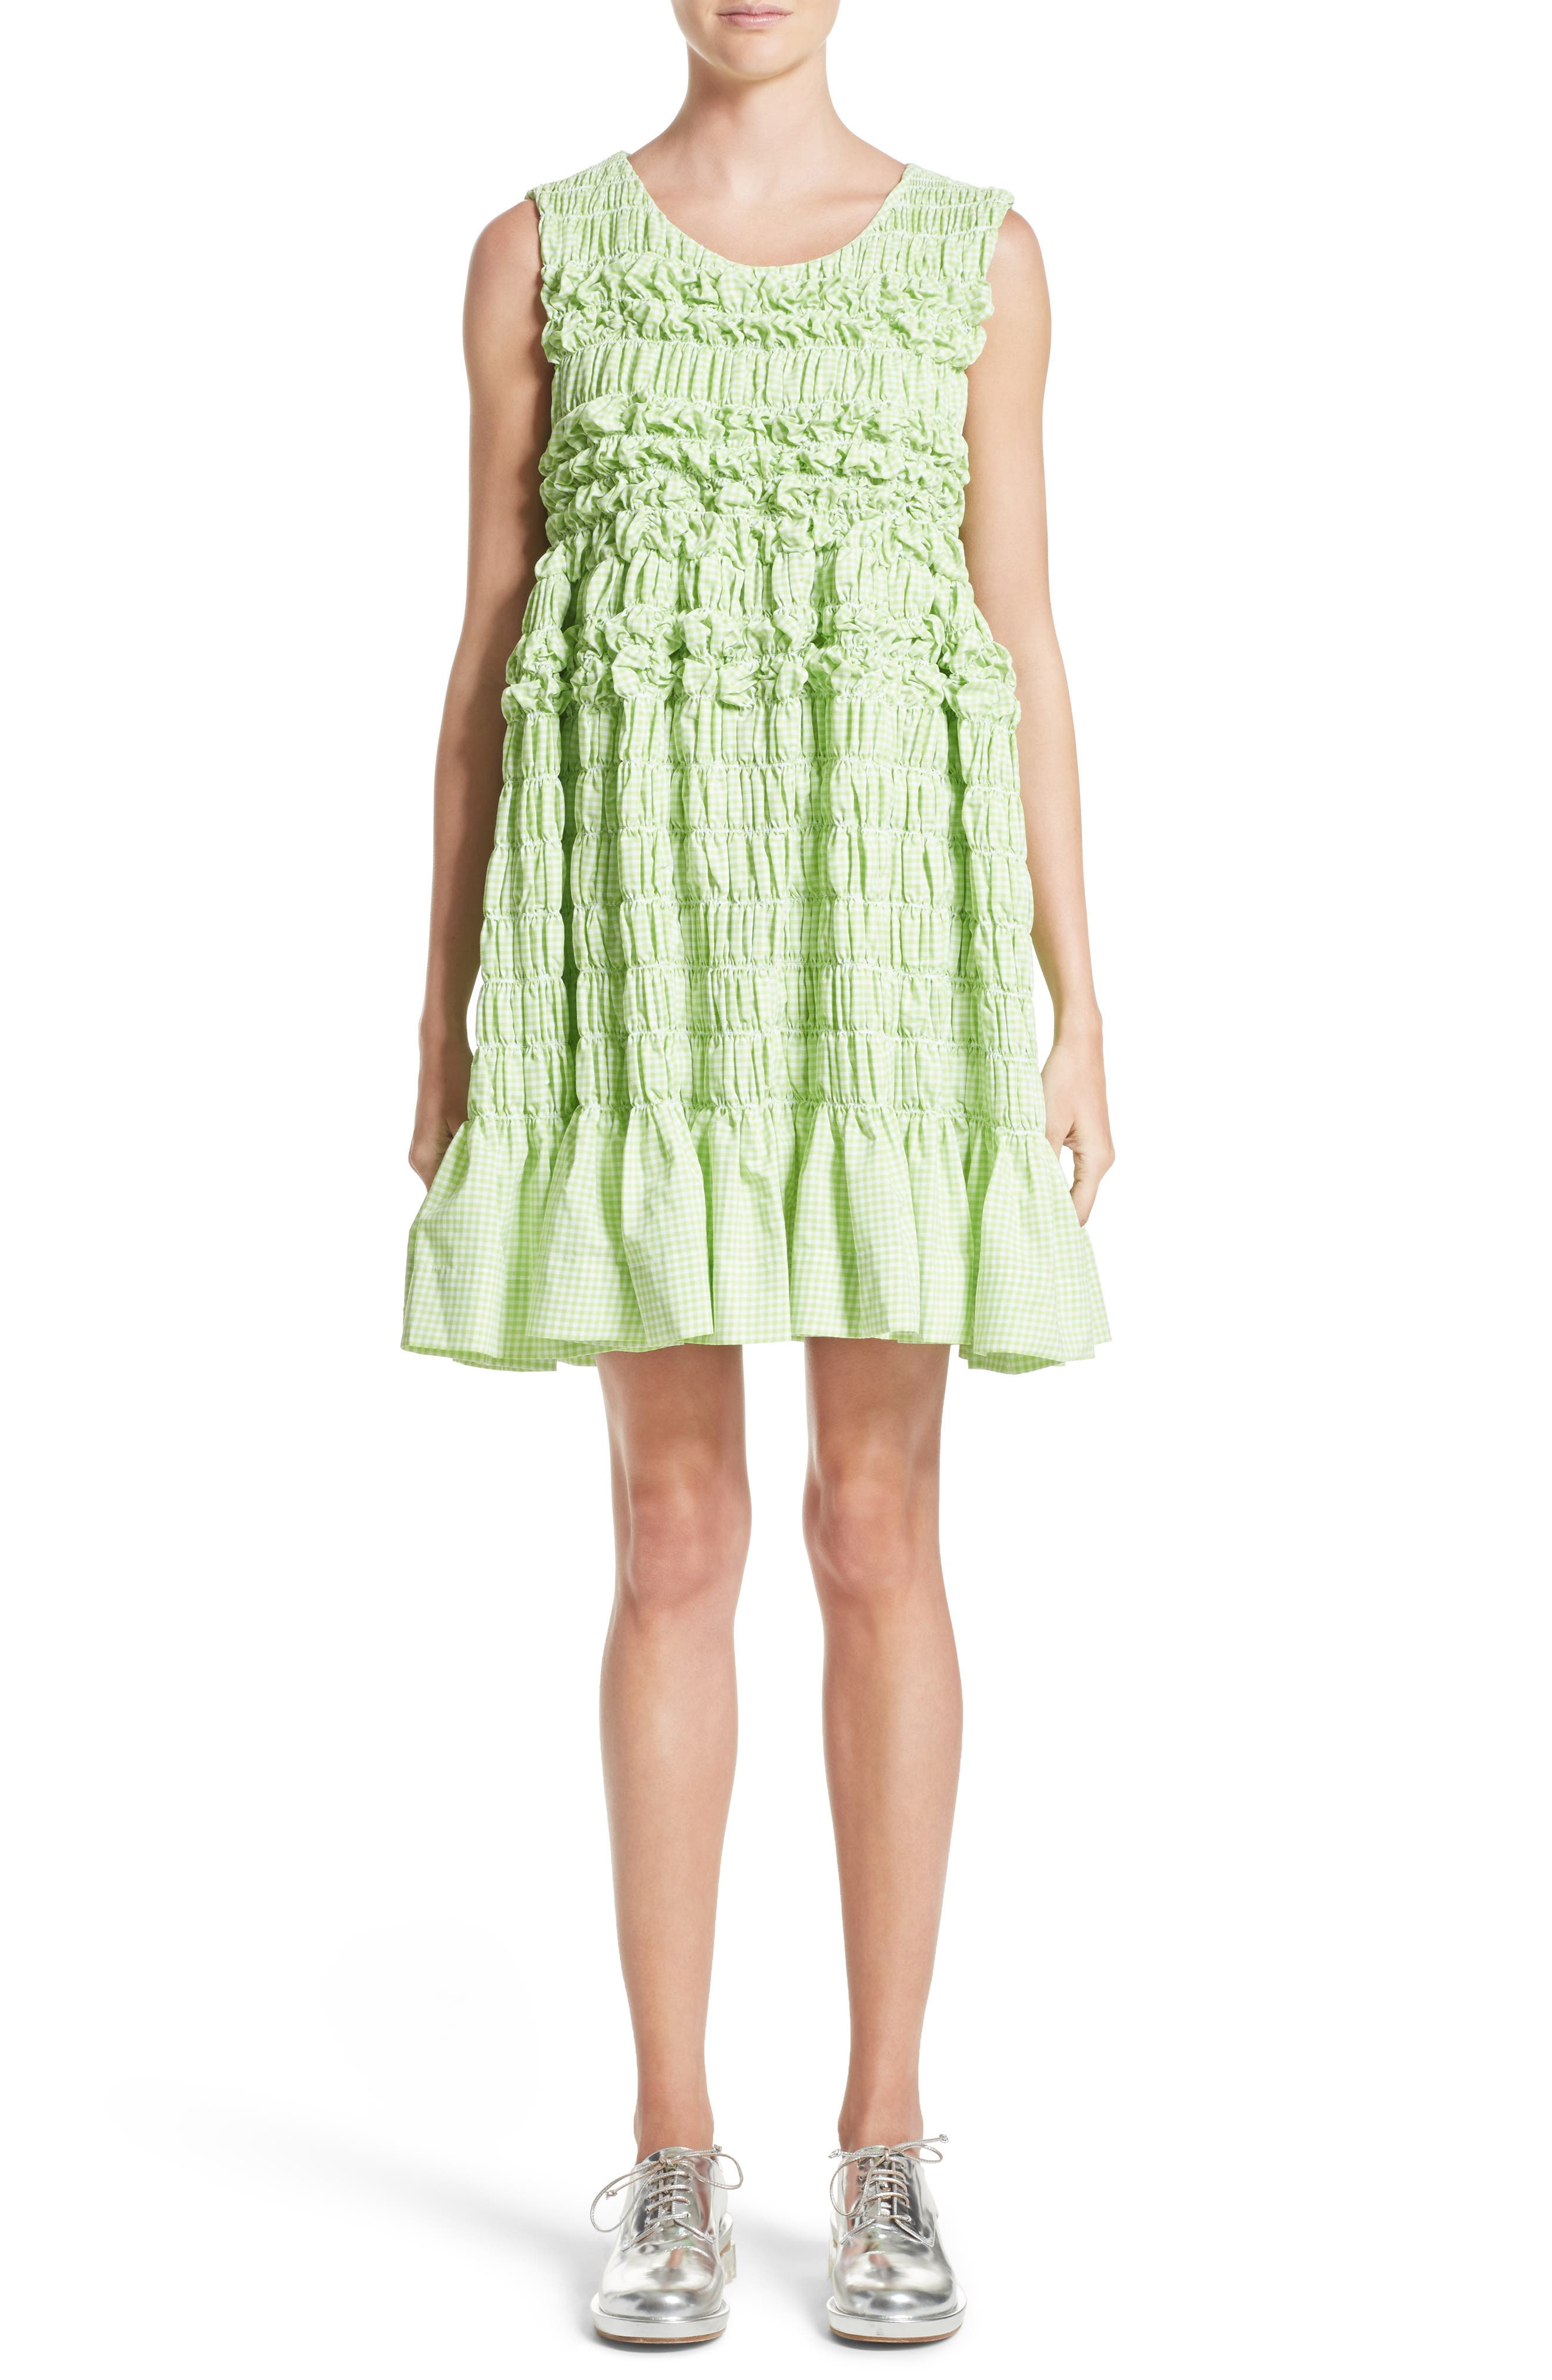 Alternate Image 1 Selected - Molly Goddard Olga Mini Dress